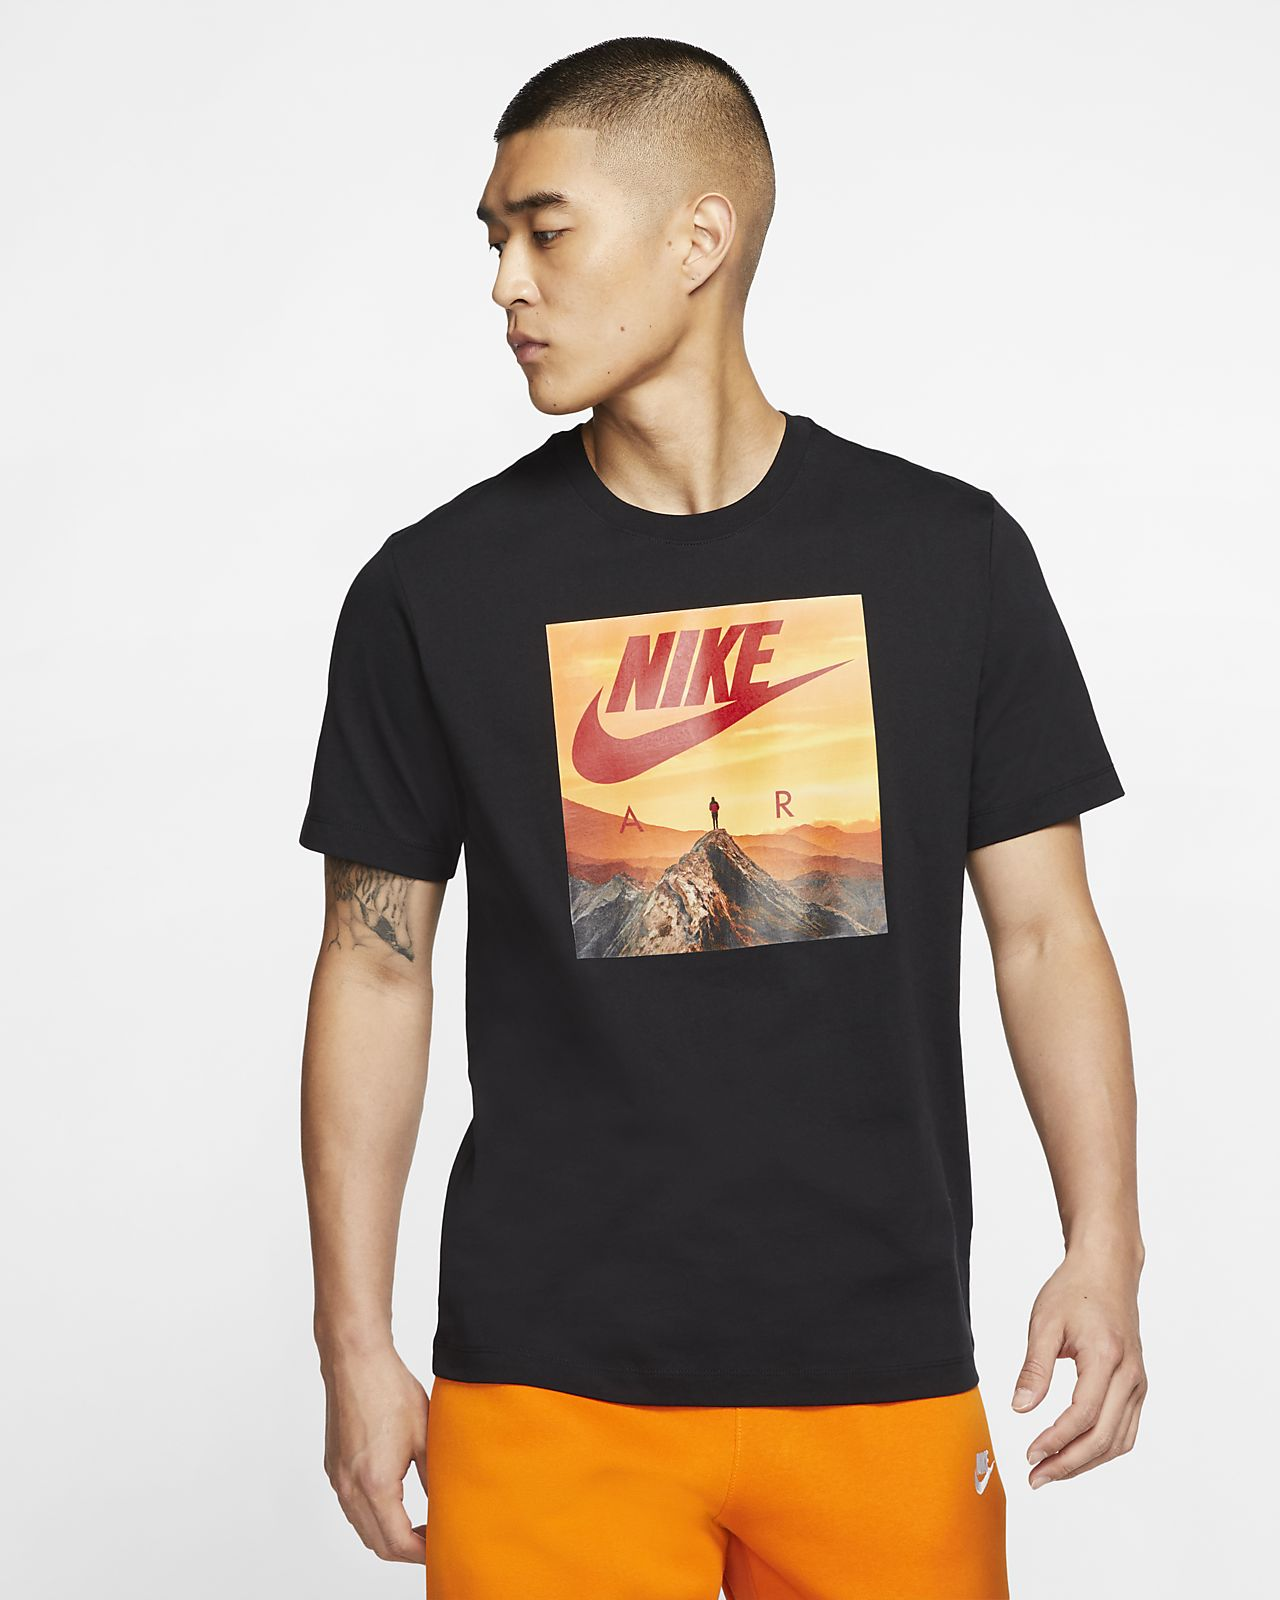 nike chaussure de foot personnalisé, Nike Haut T Shirt Air